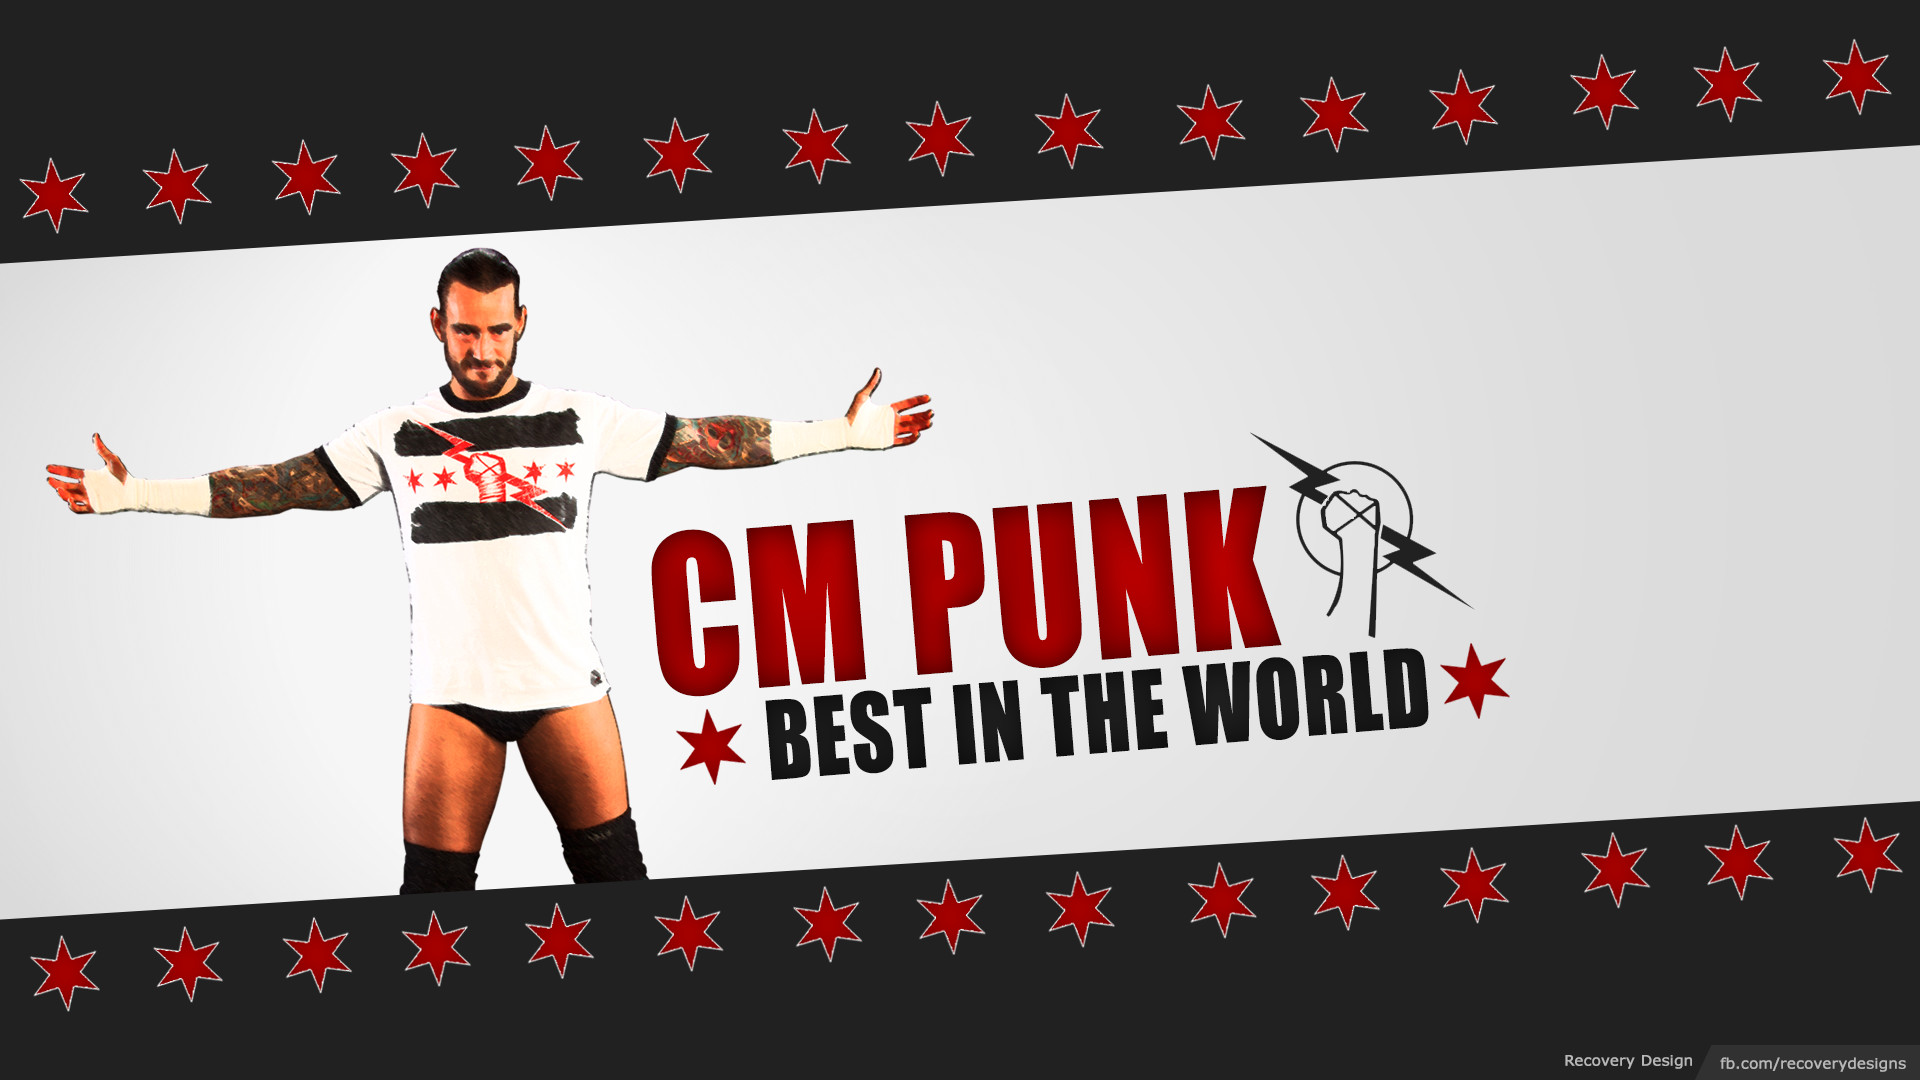 Cm Punk Logo Wallpapers 2015 – Wallpaper Cave